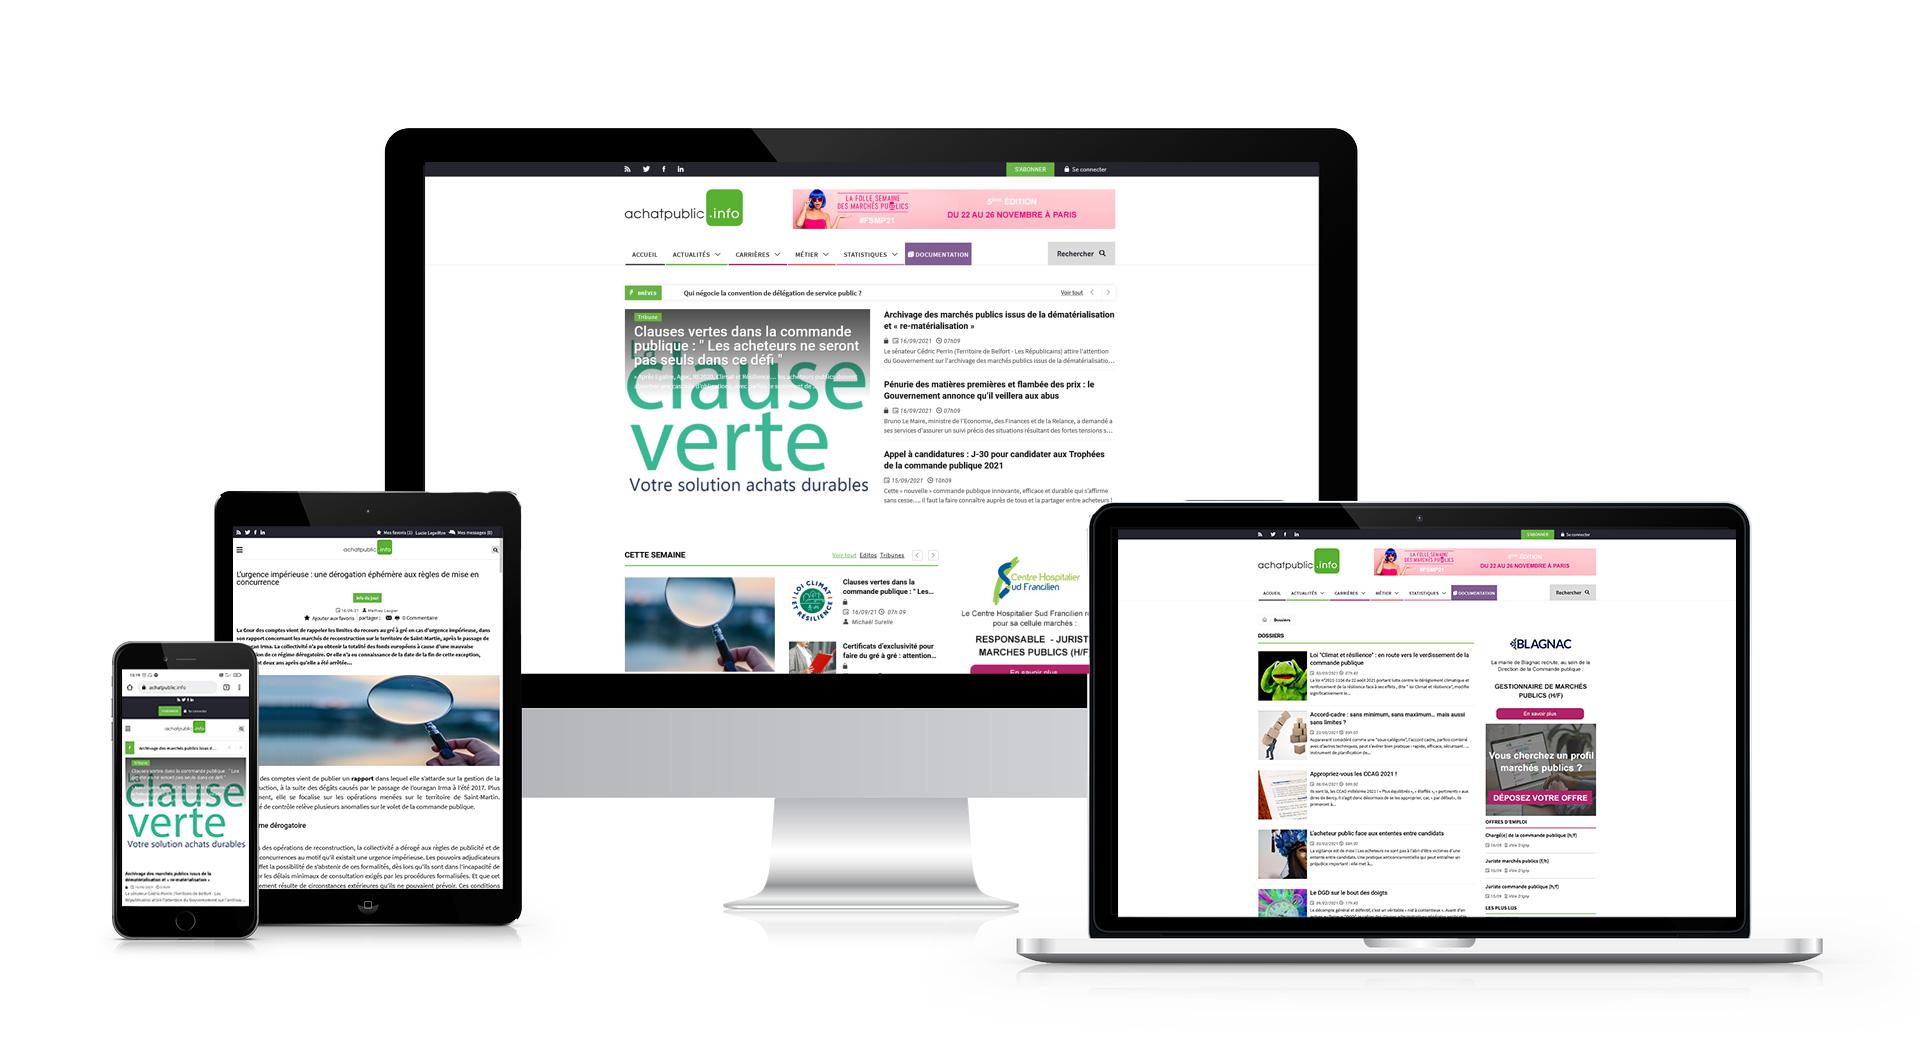 achatpublic.info - responsive design